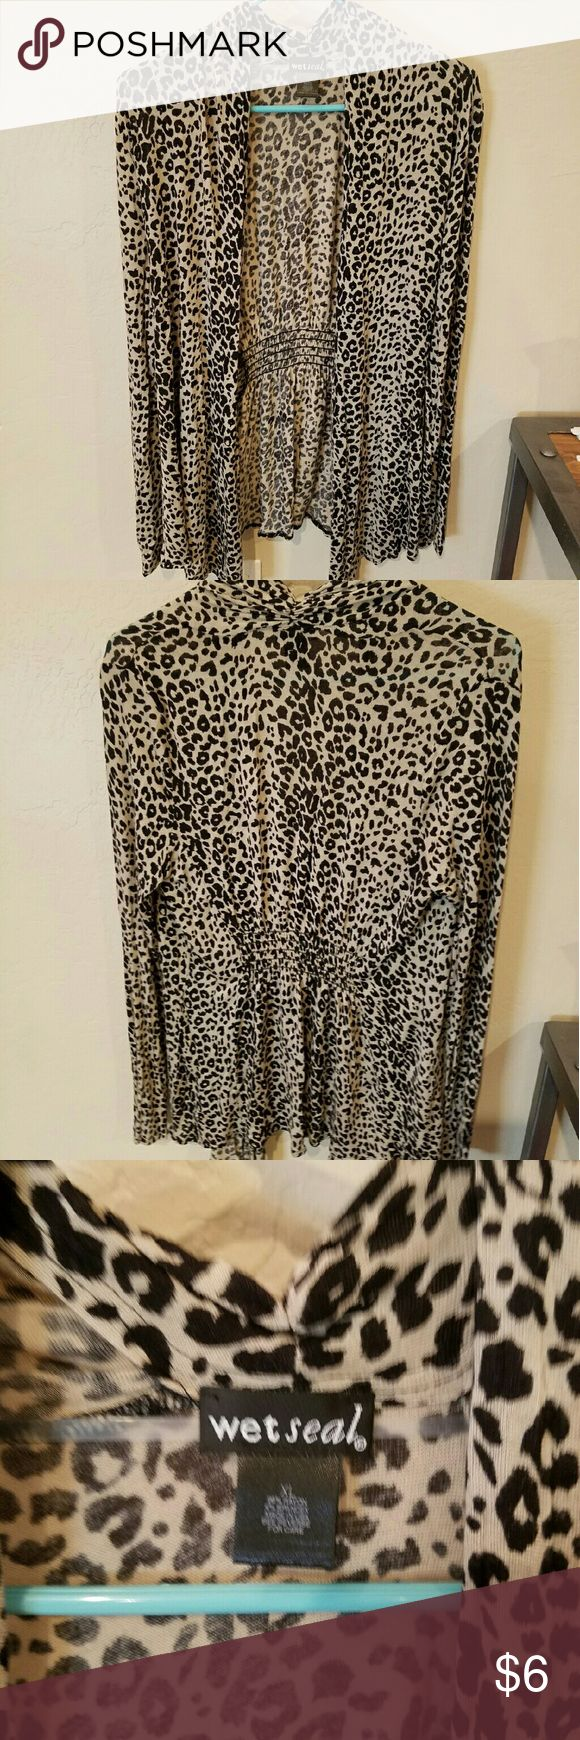 Wet Seal, Leopard/cheetah cardigan, Juniors XL Wet Seal, Leopard/cheetah Cardigan, Juniors XL. Good condition Wet Seal Sweaters